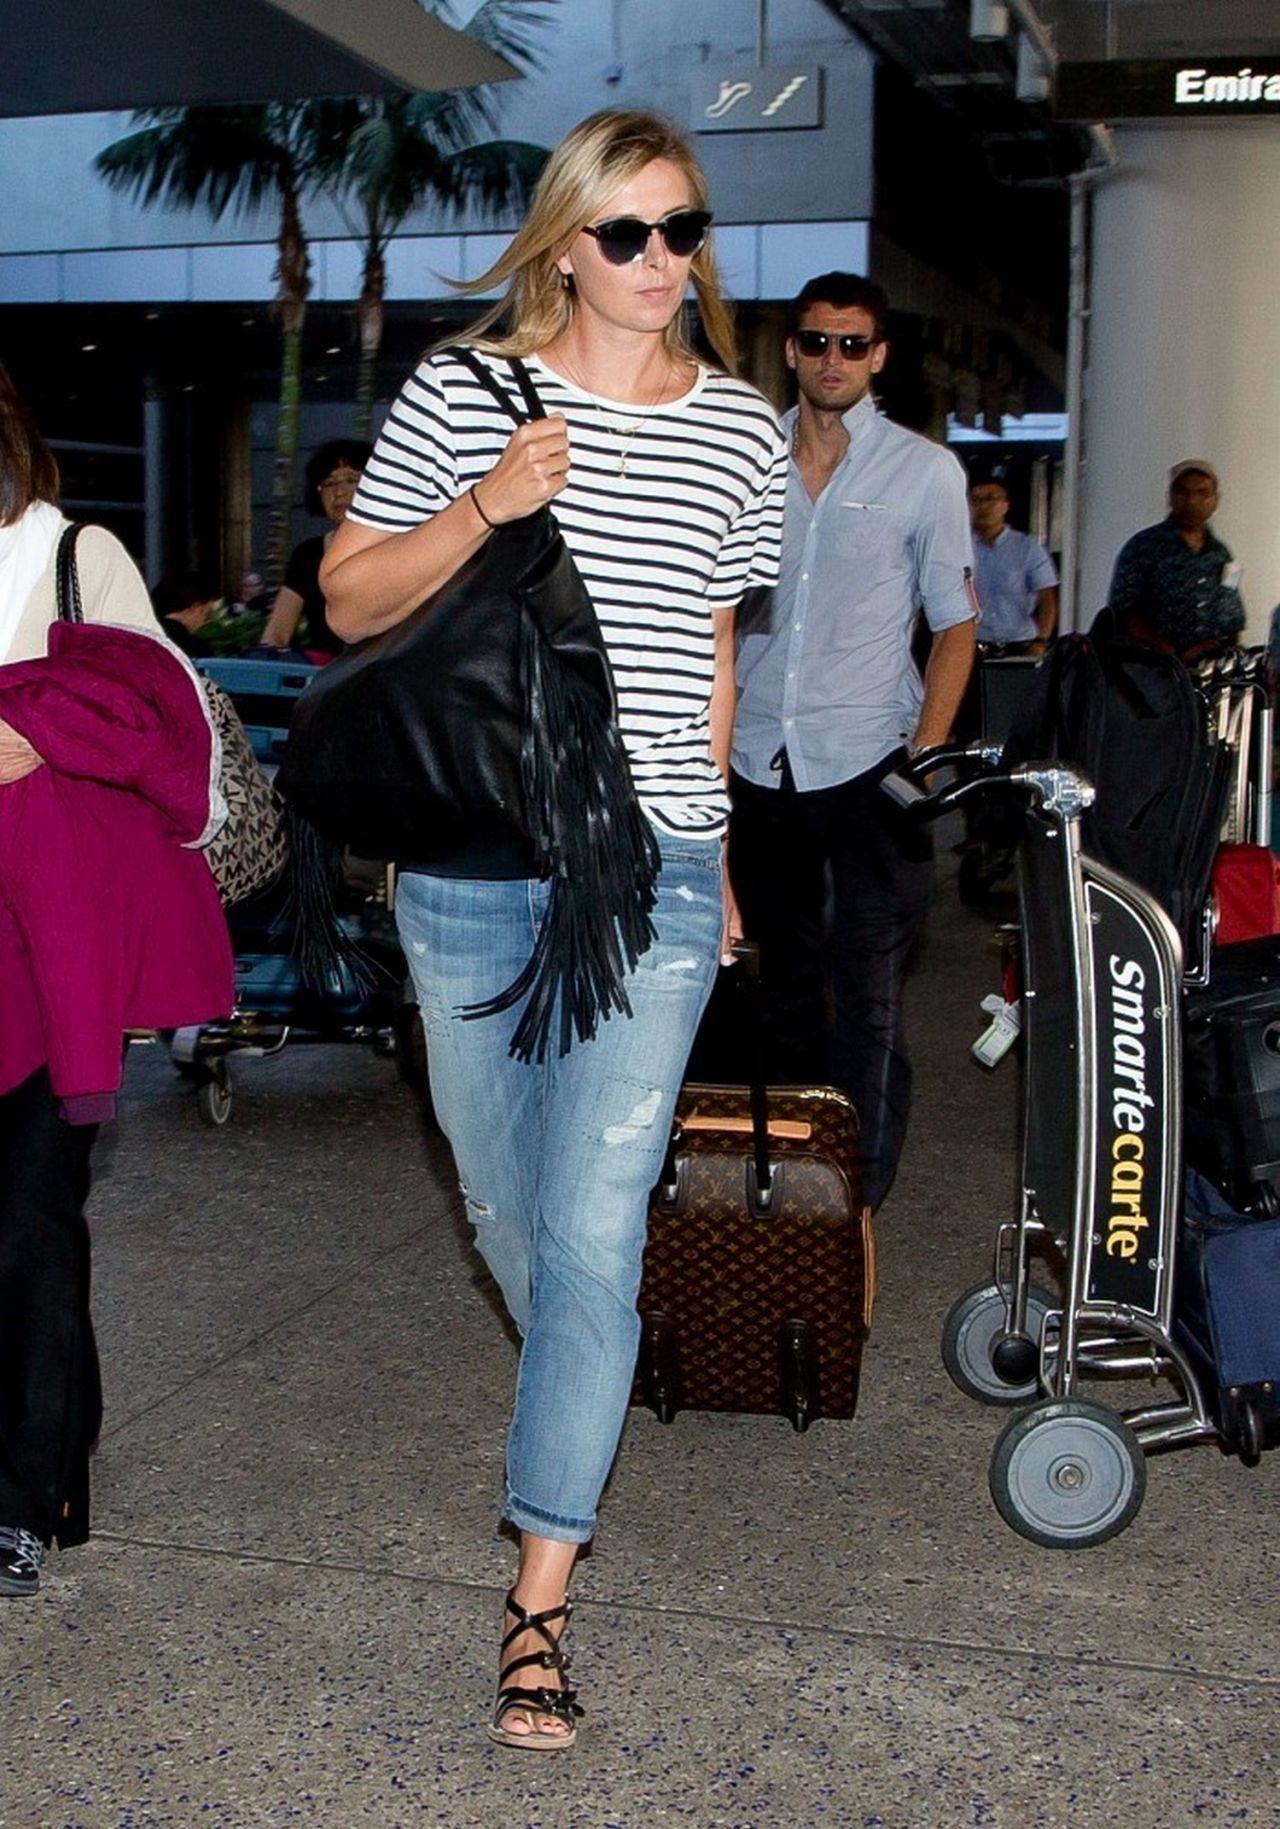 Maria Sharapova Arriving At Lax Airport July 2014